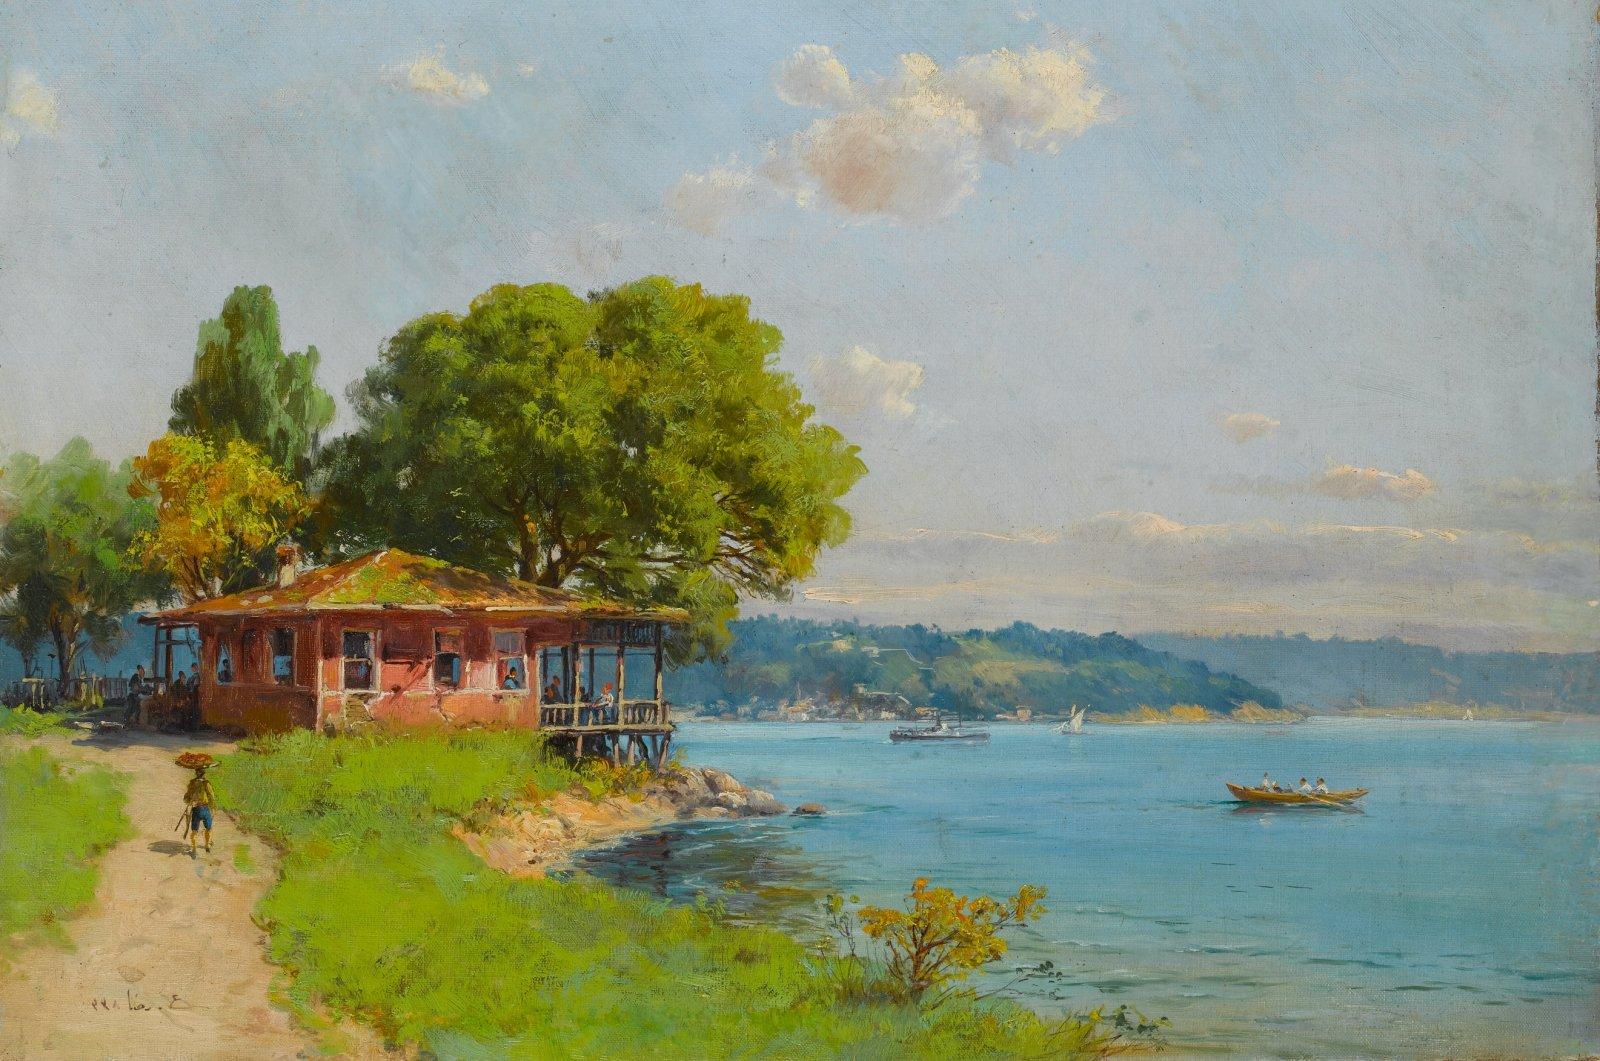 """Istanbul,"" Hoca Ali Rıza, oil on canvas, 43.5 by 61 centimeters. (Courtesy of SSM)"